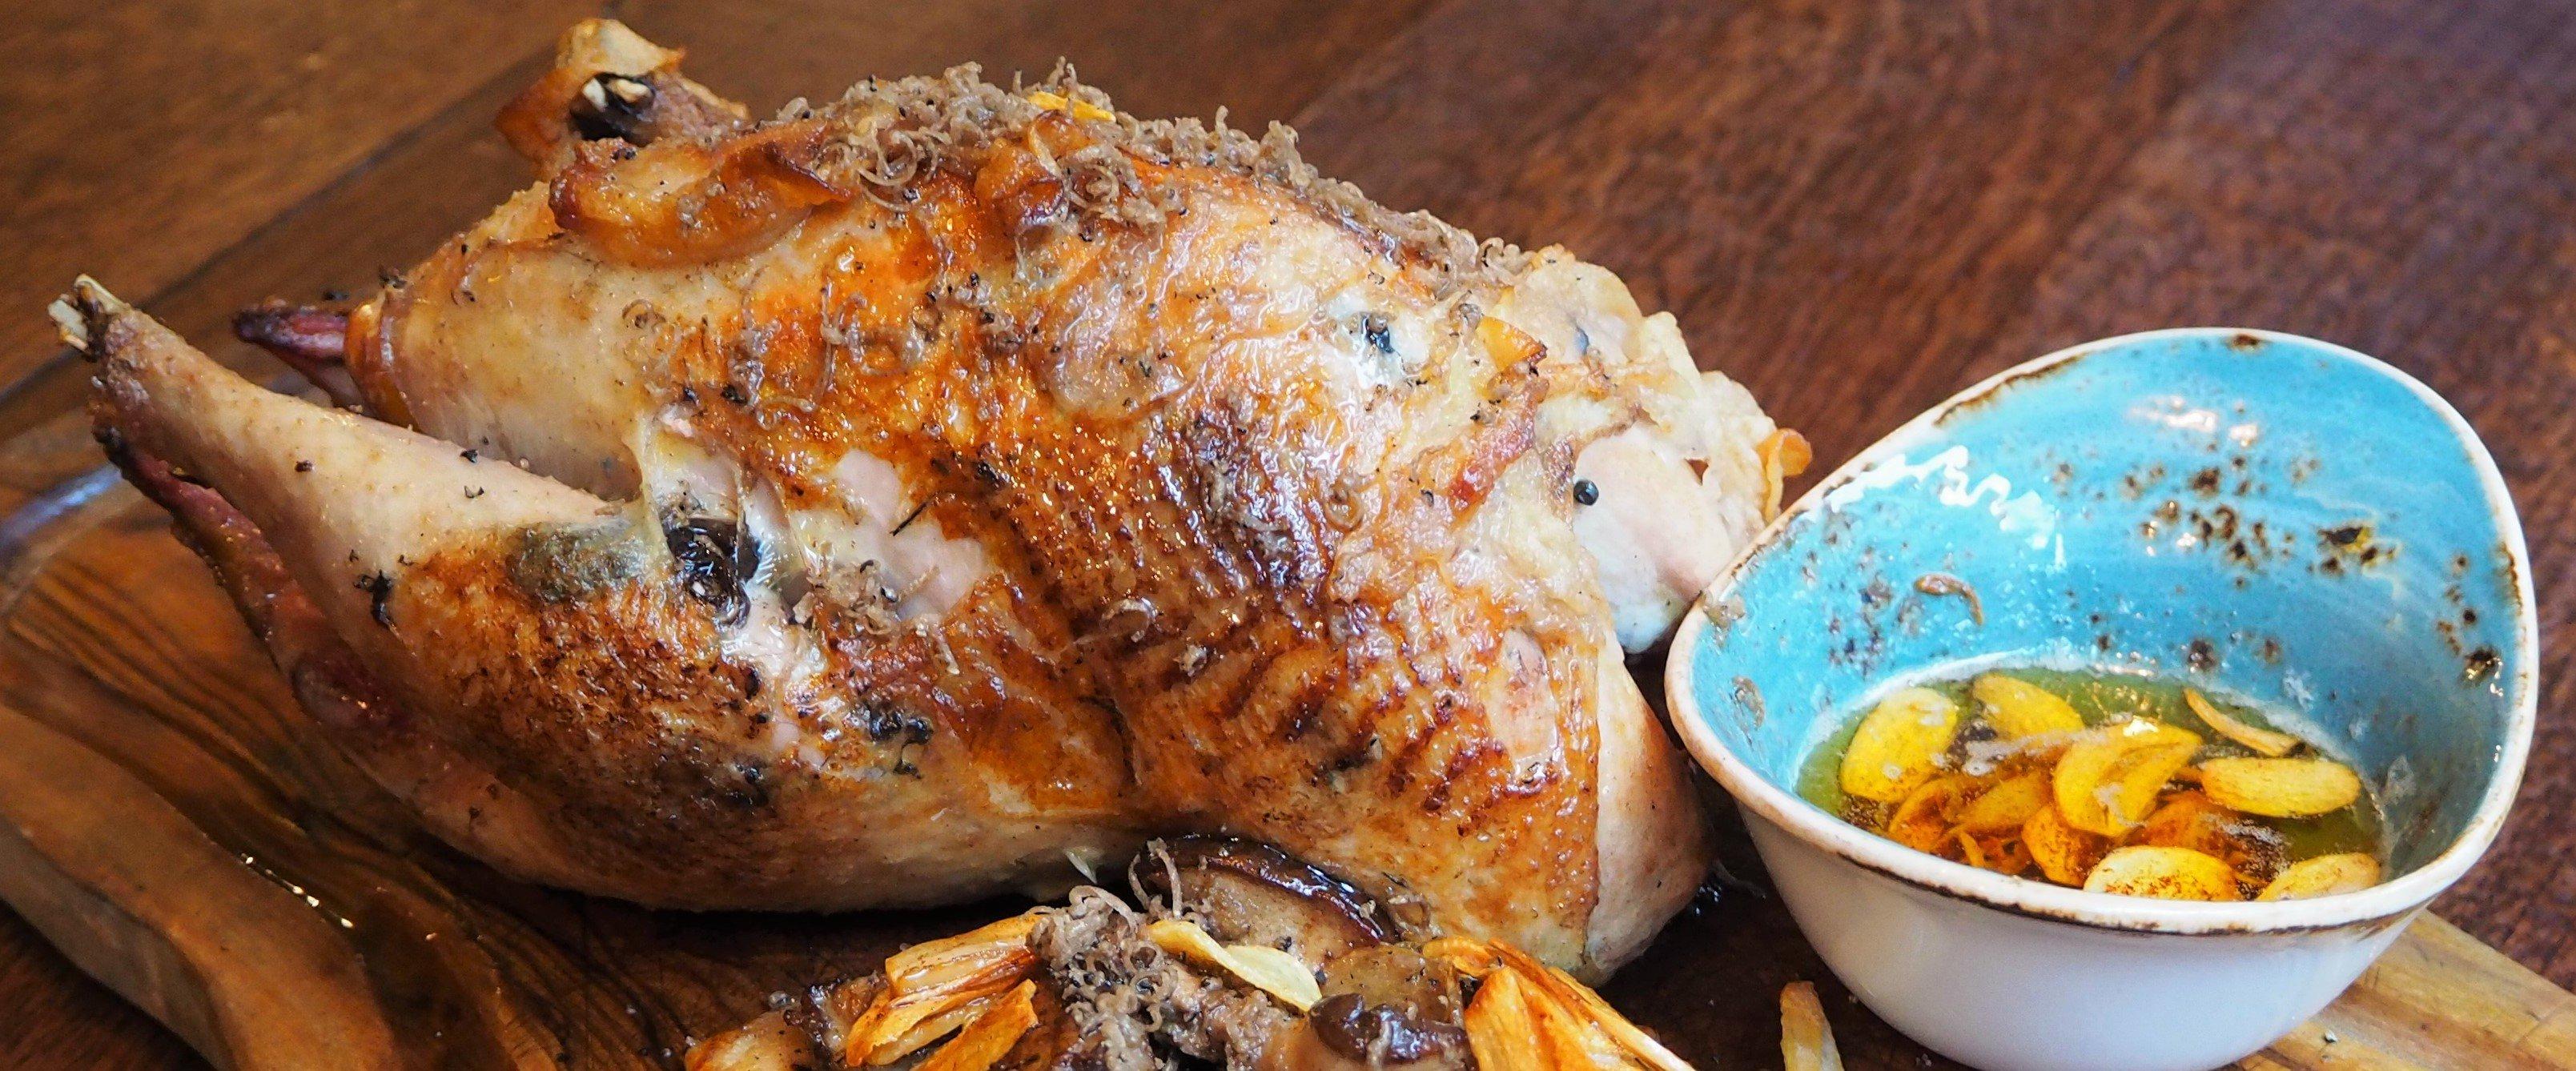 kerst fazant truffelboter